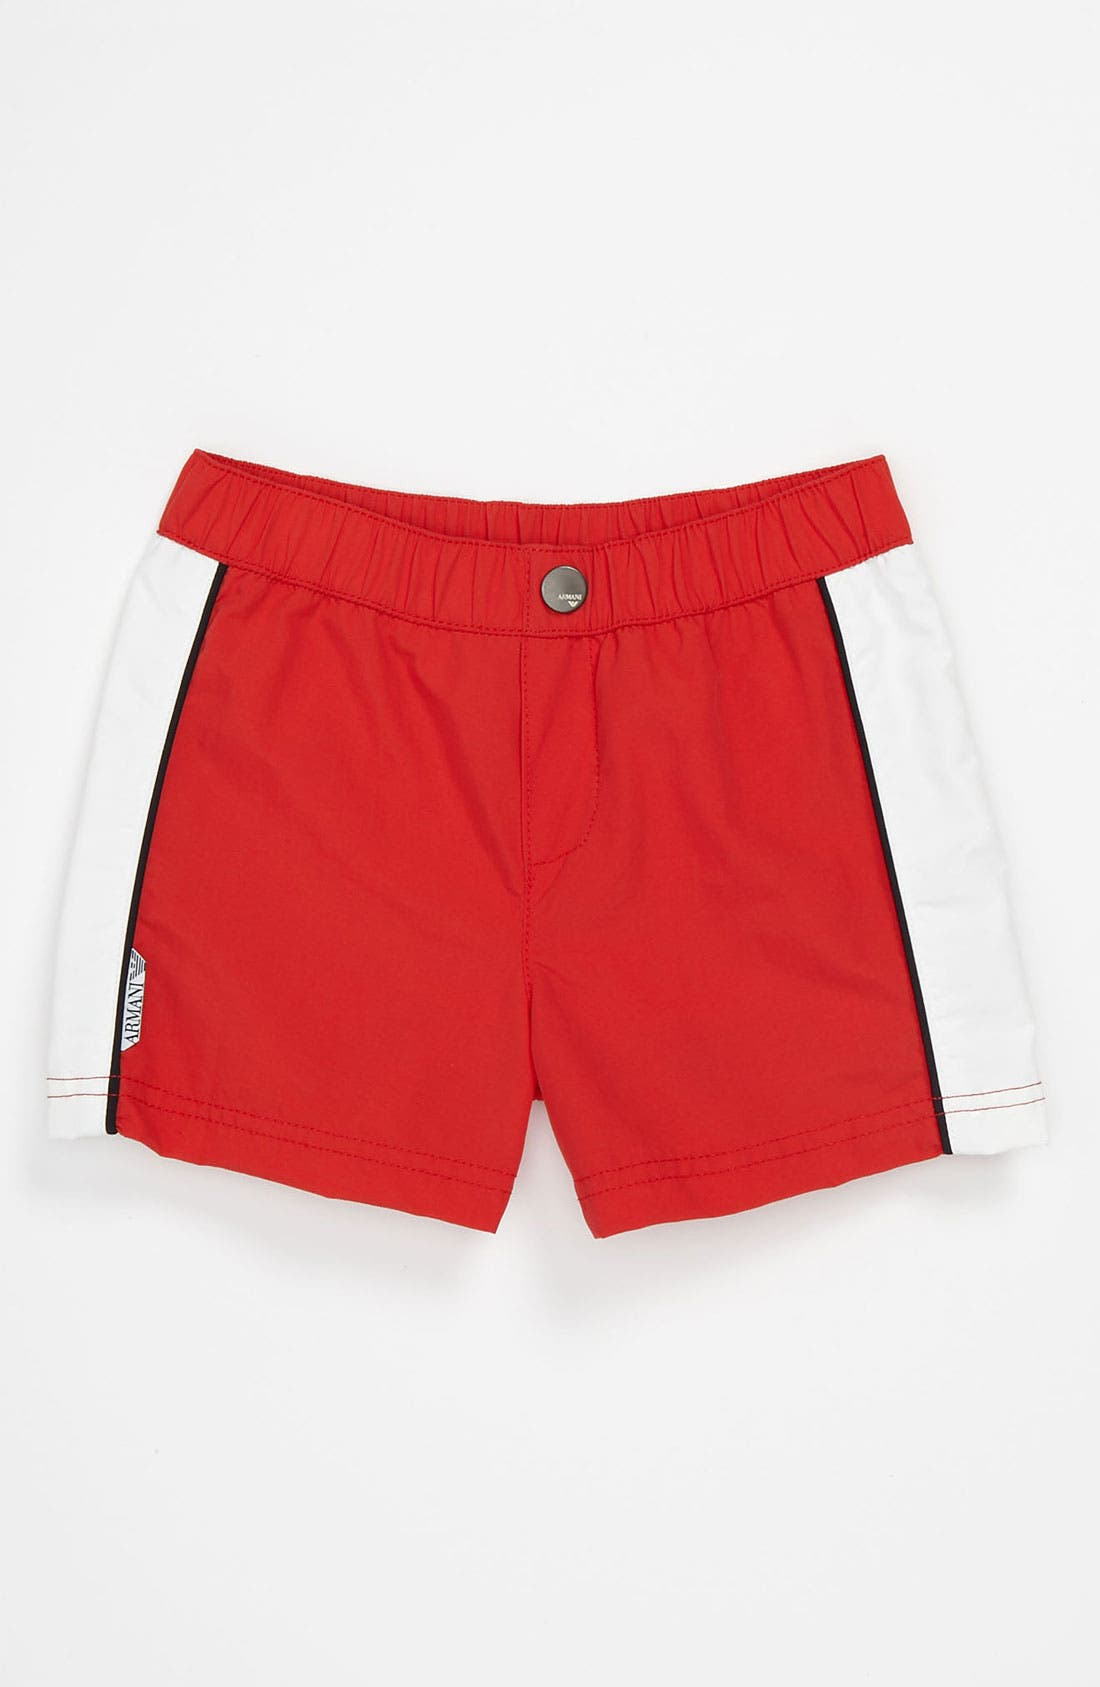 Alternate Image 1 Selected - Armani Junior Swim Trunks (Baby)